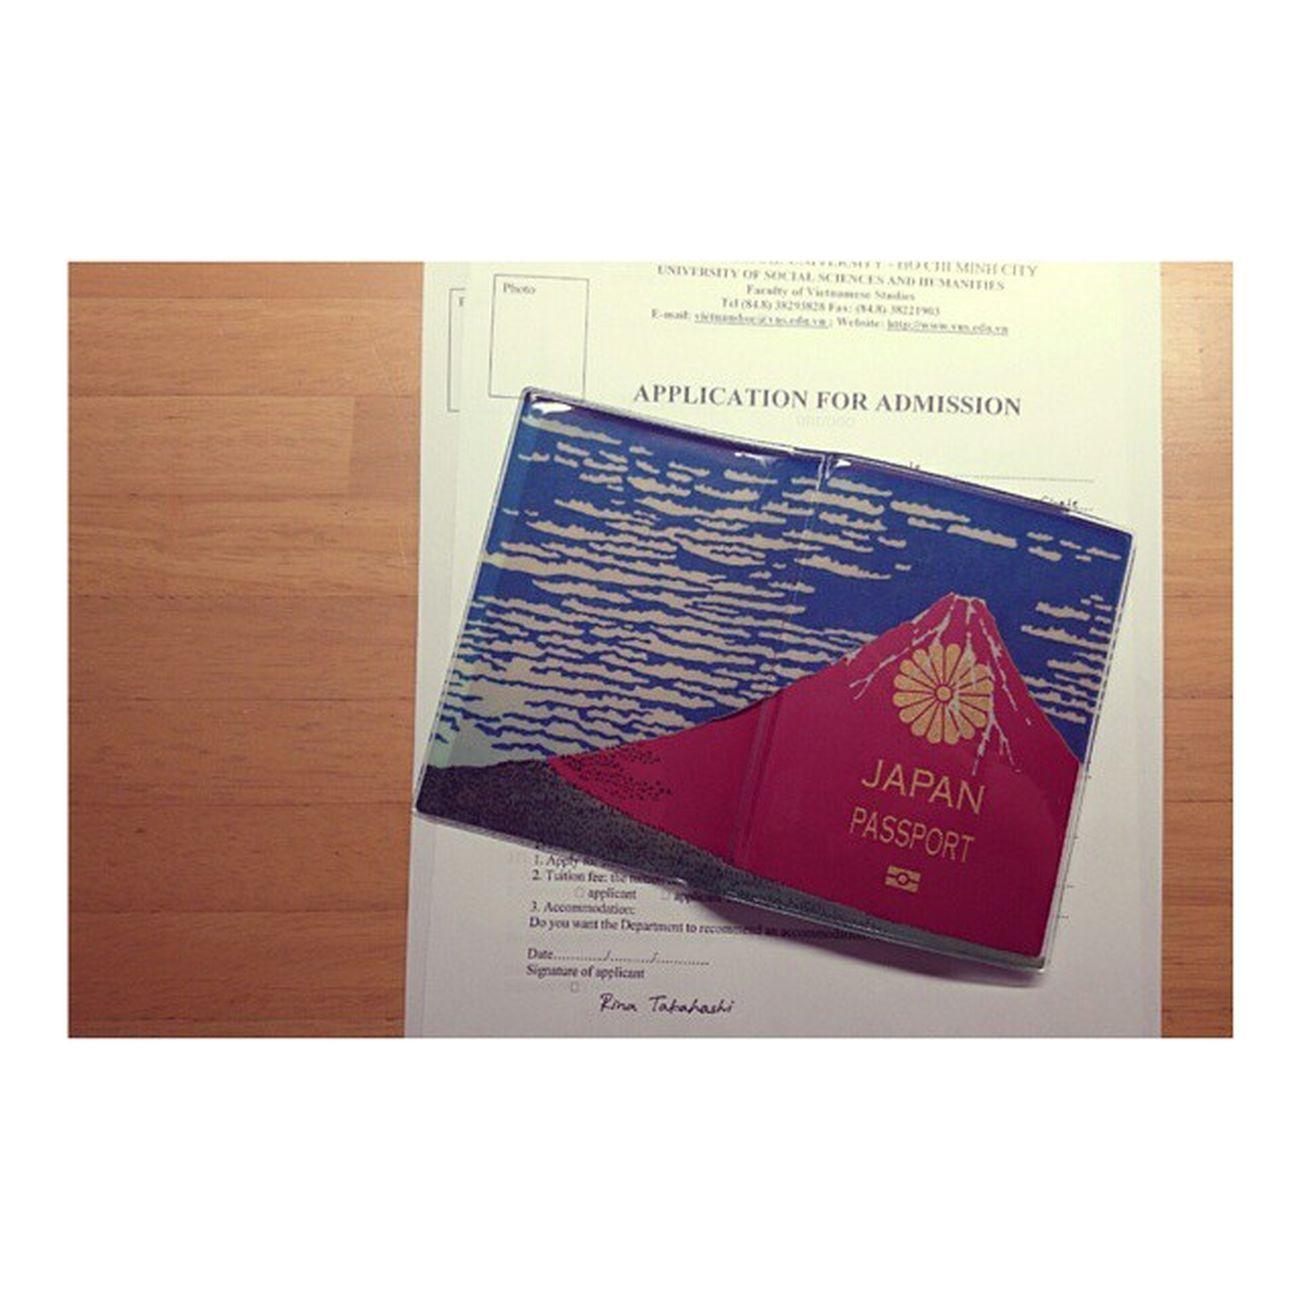 Application 書き終わった✔ あとは出願するのみ...! 留学 ベトナム パスポート パスポートケース Akafuji Japan Passport Vietnam Studyabroad Hochiminh VNU USSH Collegelife